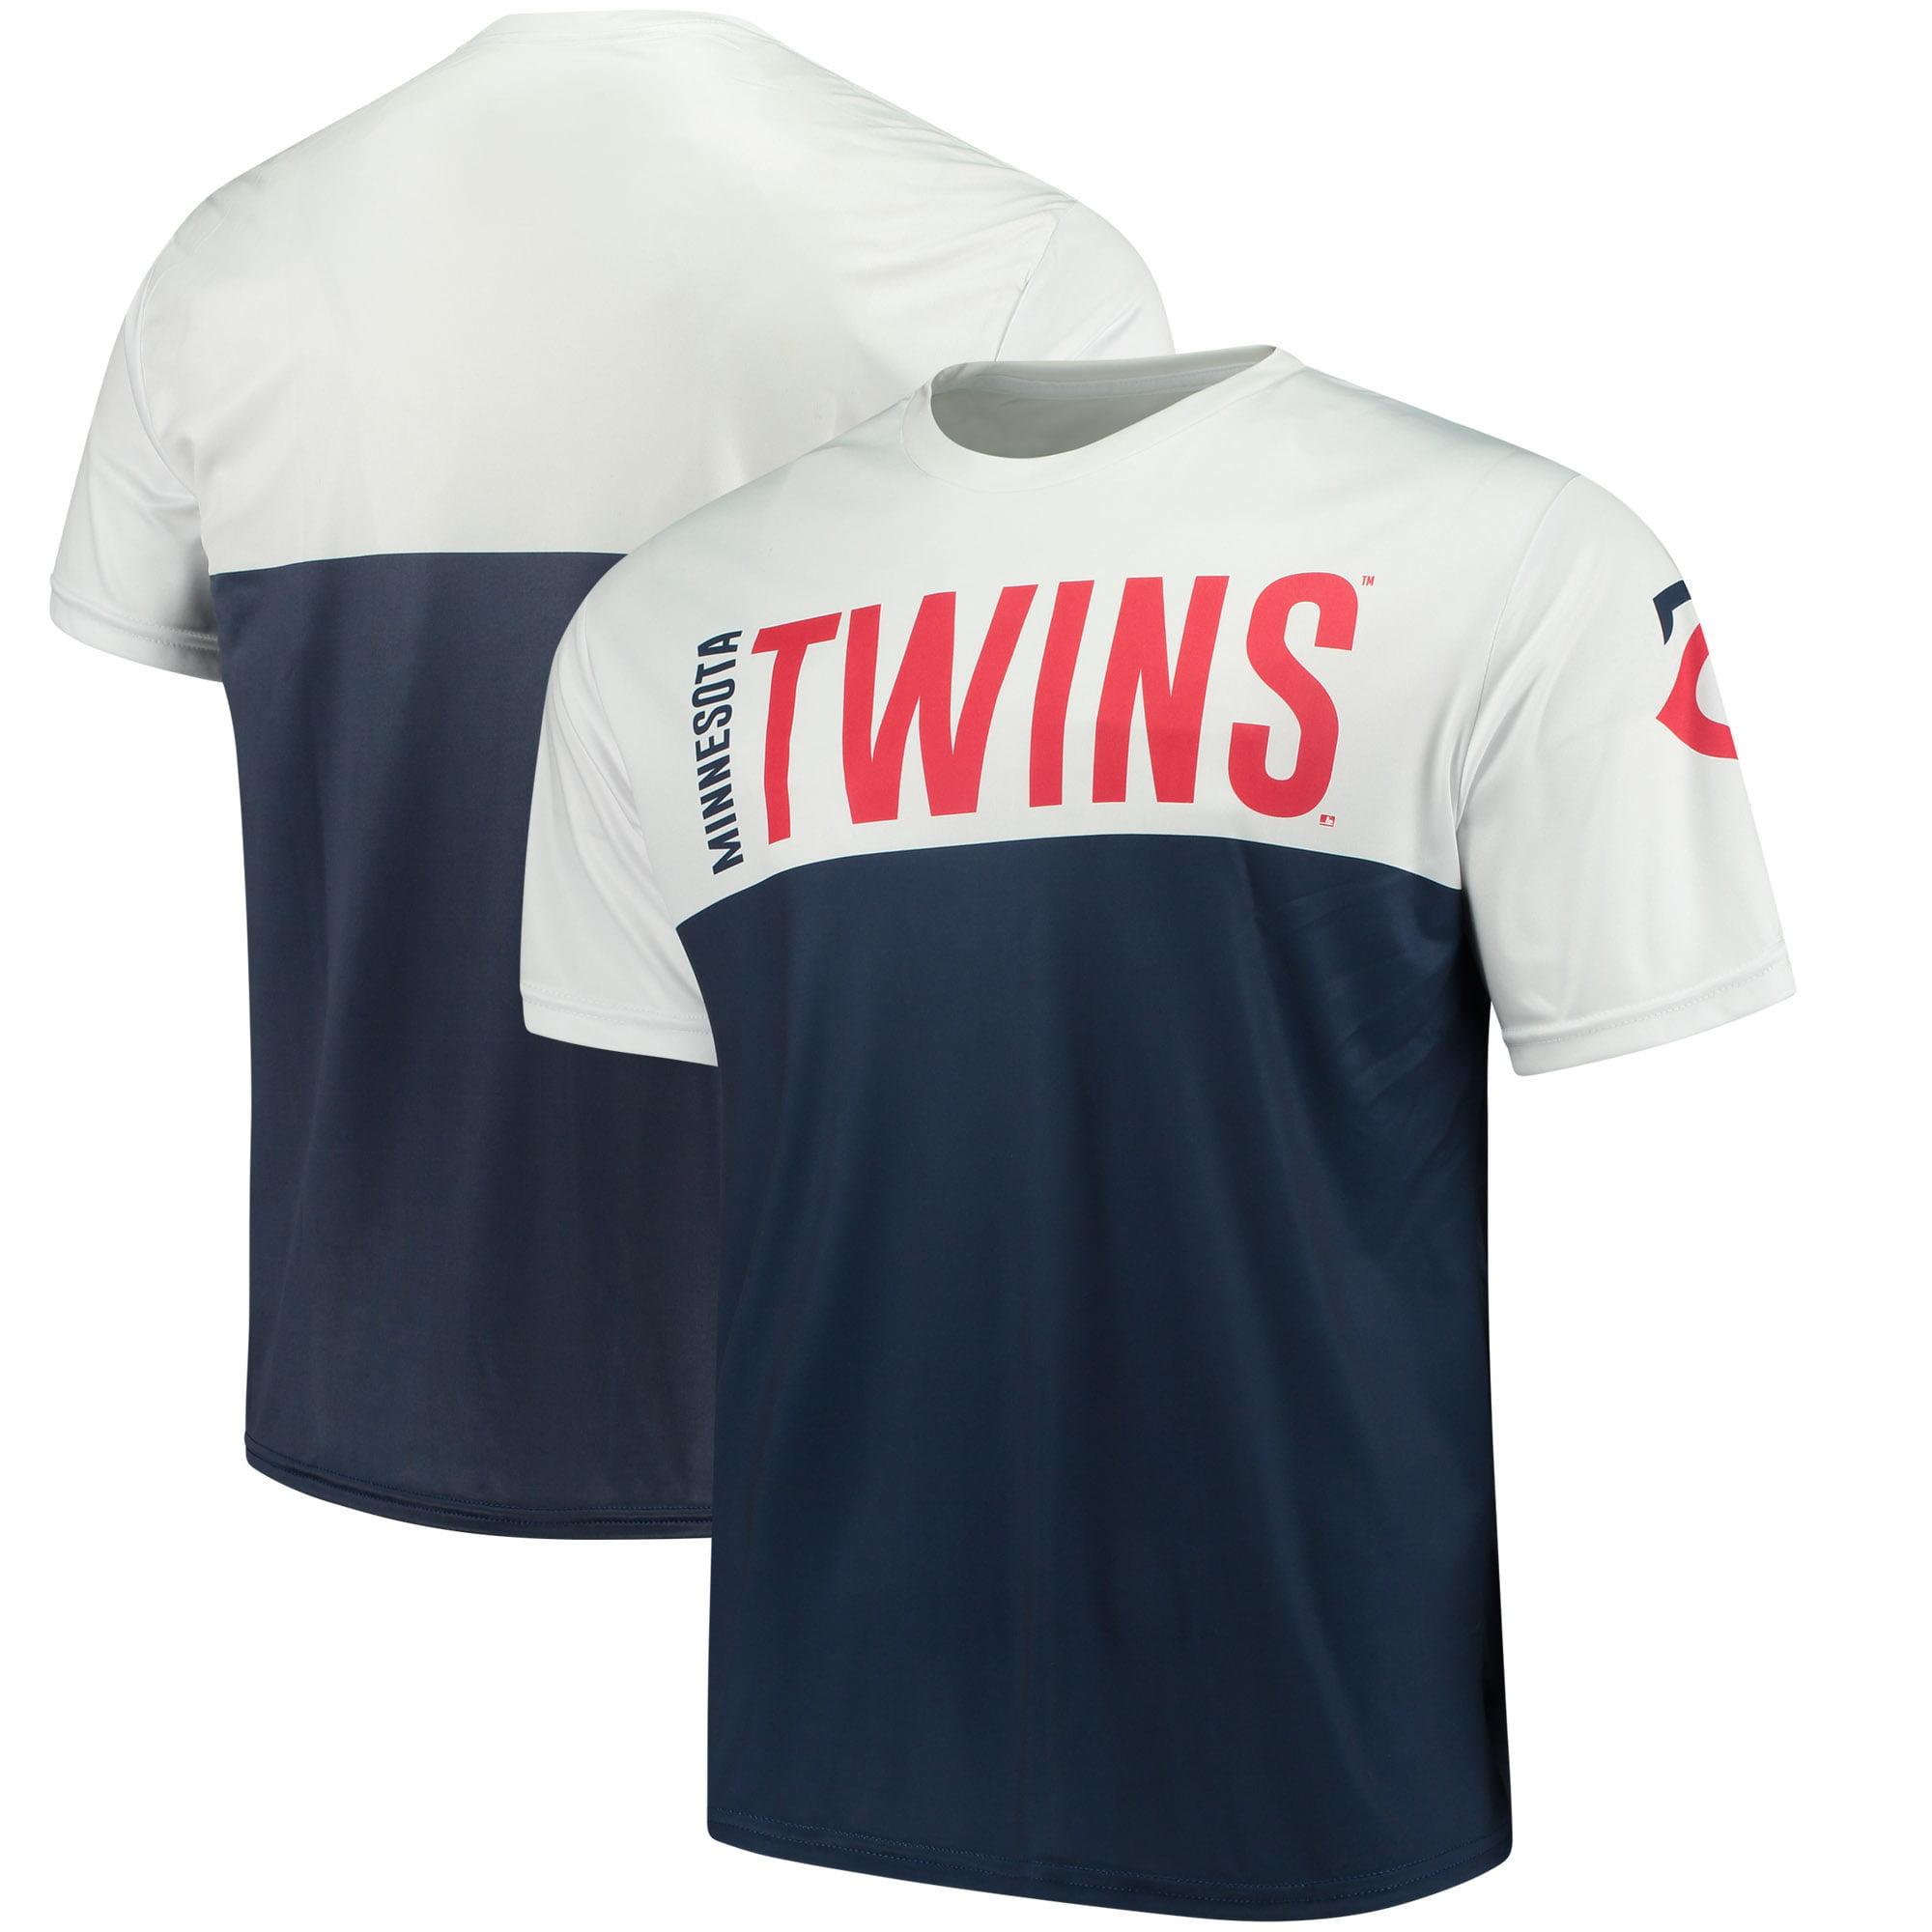 Minnesota Twins Colorblock Sublimated T-Shirt - Navy